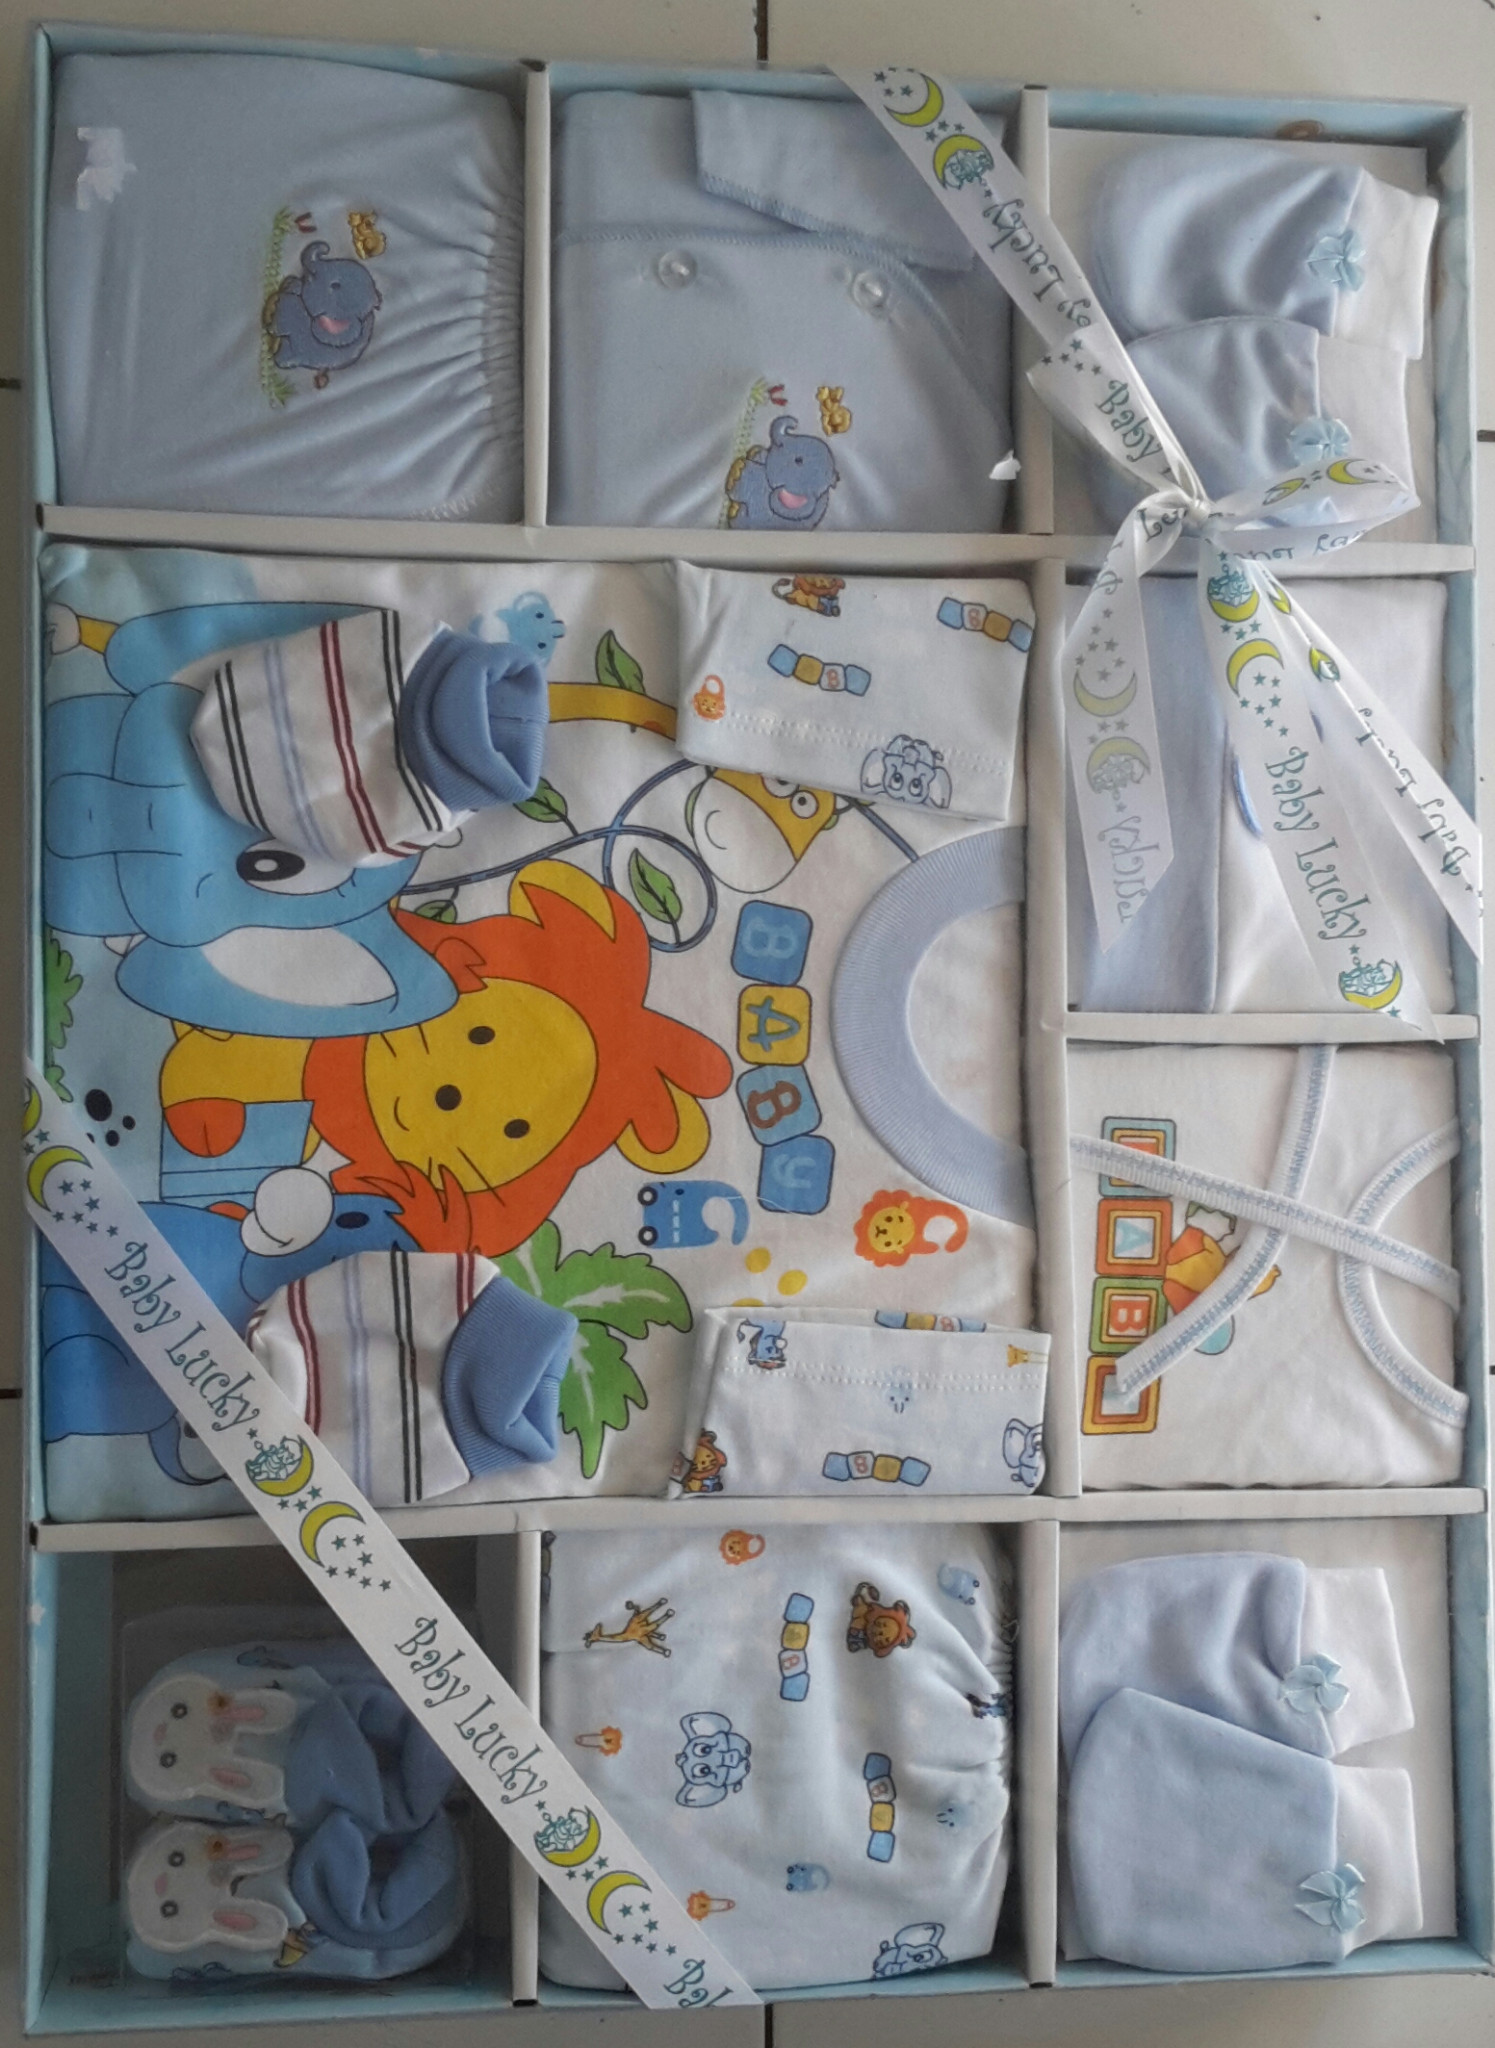 Jual Baby Gift Set Murah Ideas Pigeon Parcel Standard 1 Pa051001 Lucky Jumbo Pakaian Bayi Biru Lion Obral Kado Tukita Tokopedia